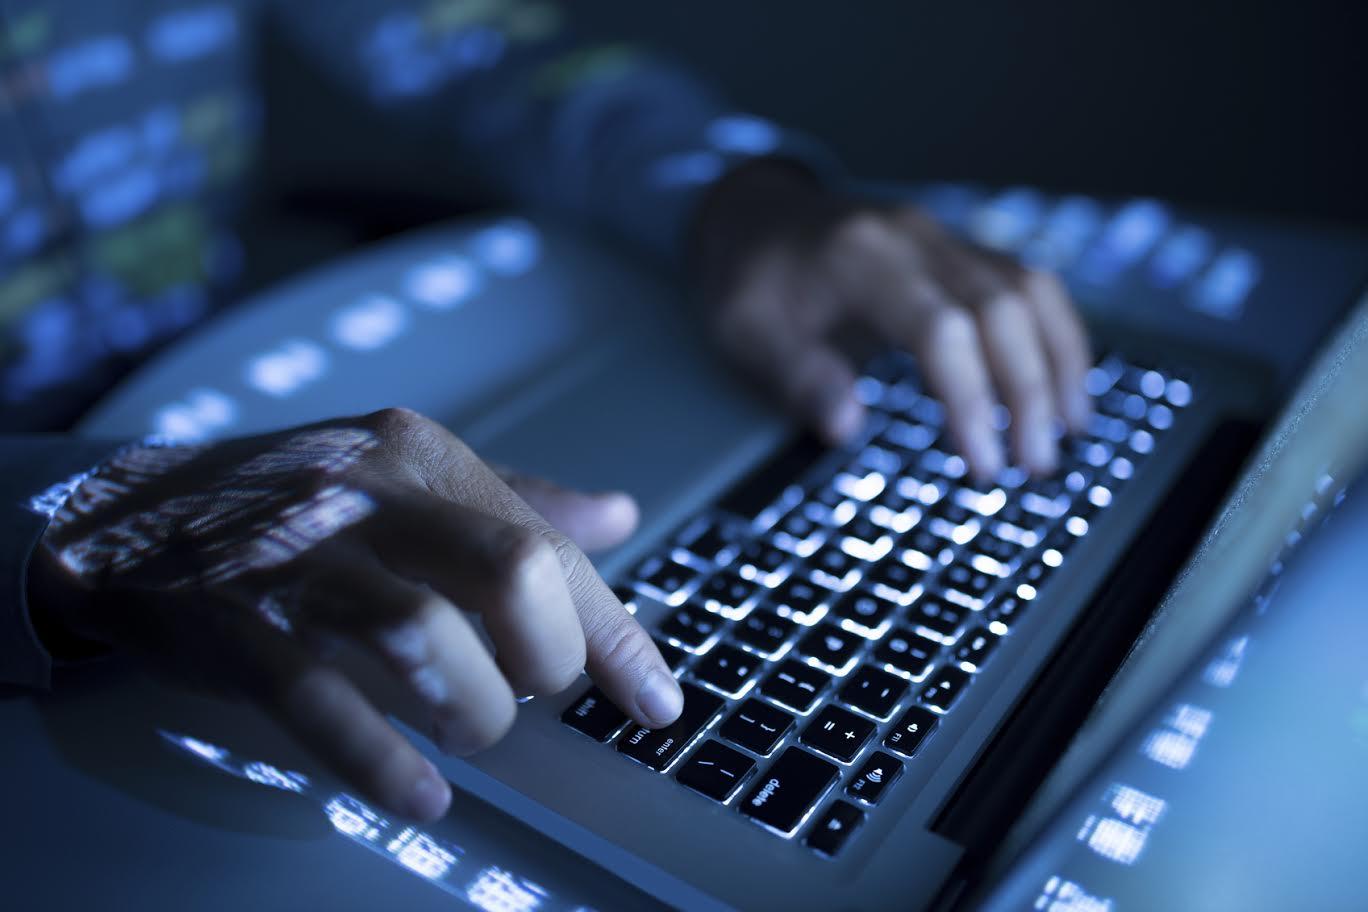 Wikileaks office Server Wikileaks Publishes User Guide And Source Code For Cias Secret Antileaker Tool scribble Washington Post Wikileaks Publishes User Guide And Source Code For Cias Secret